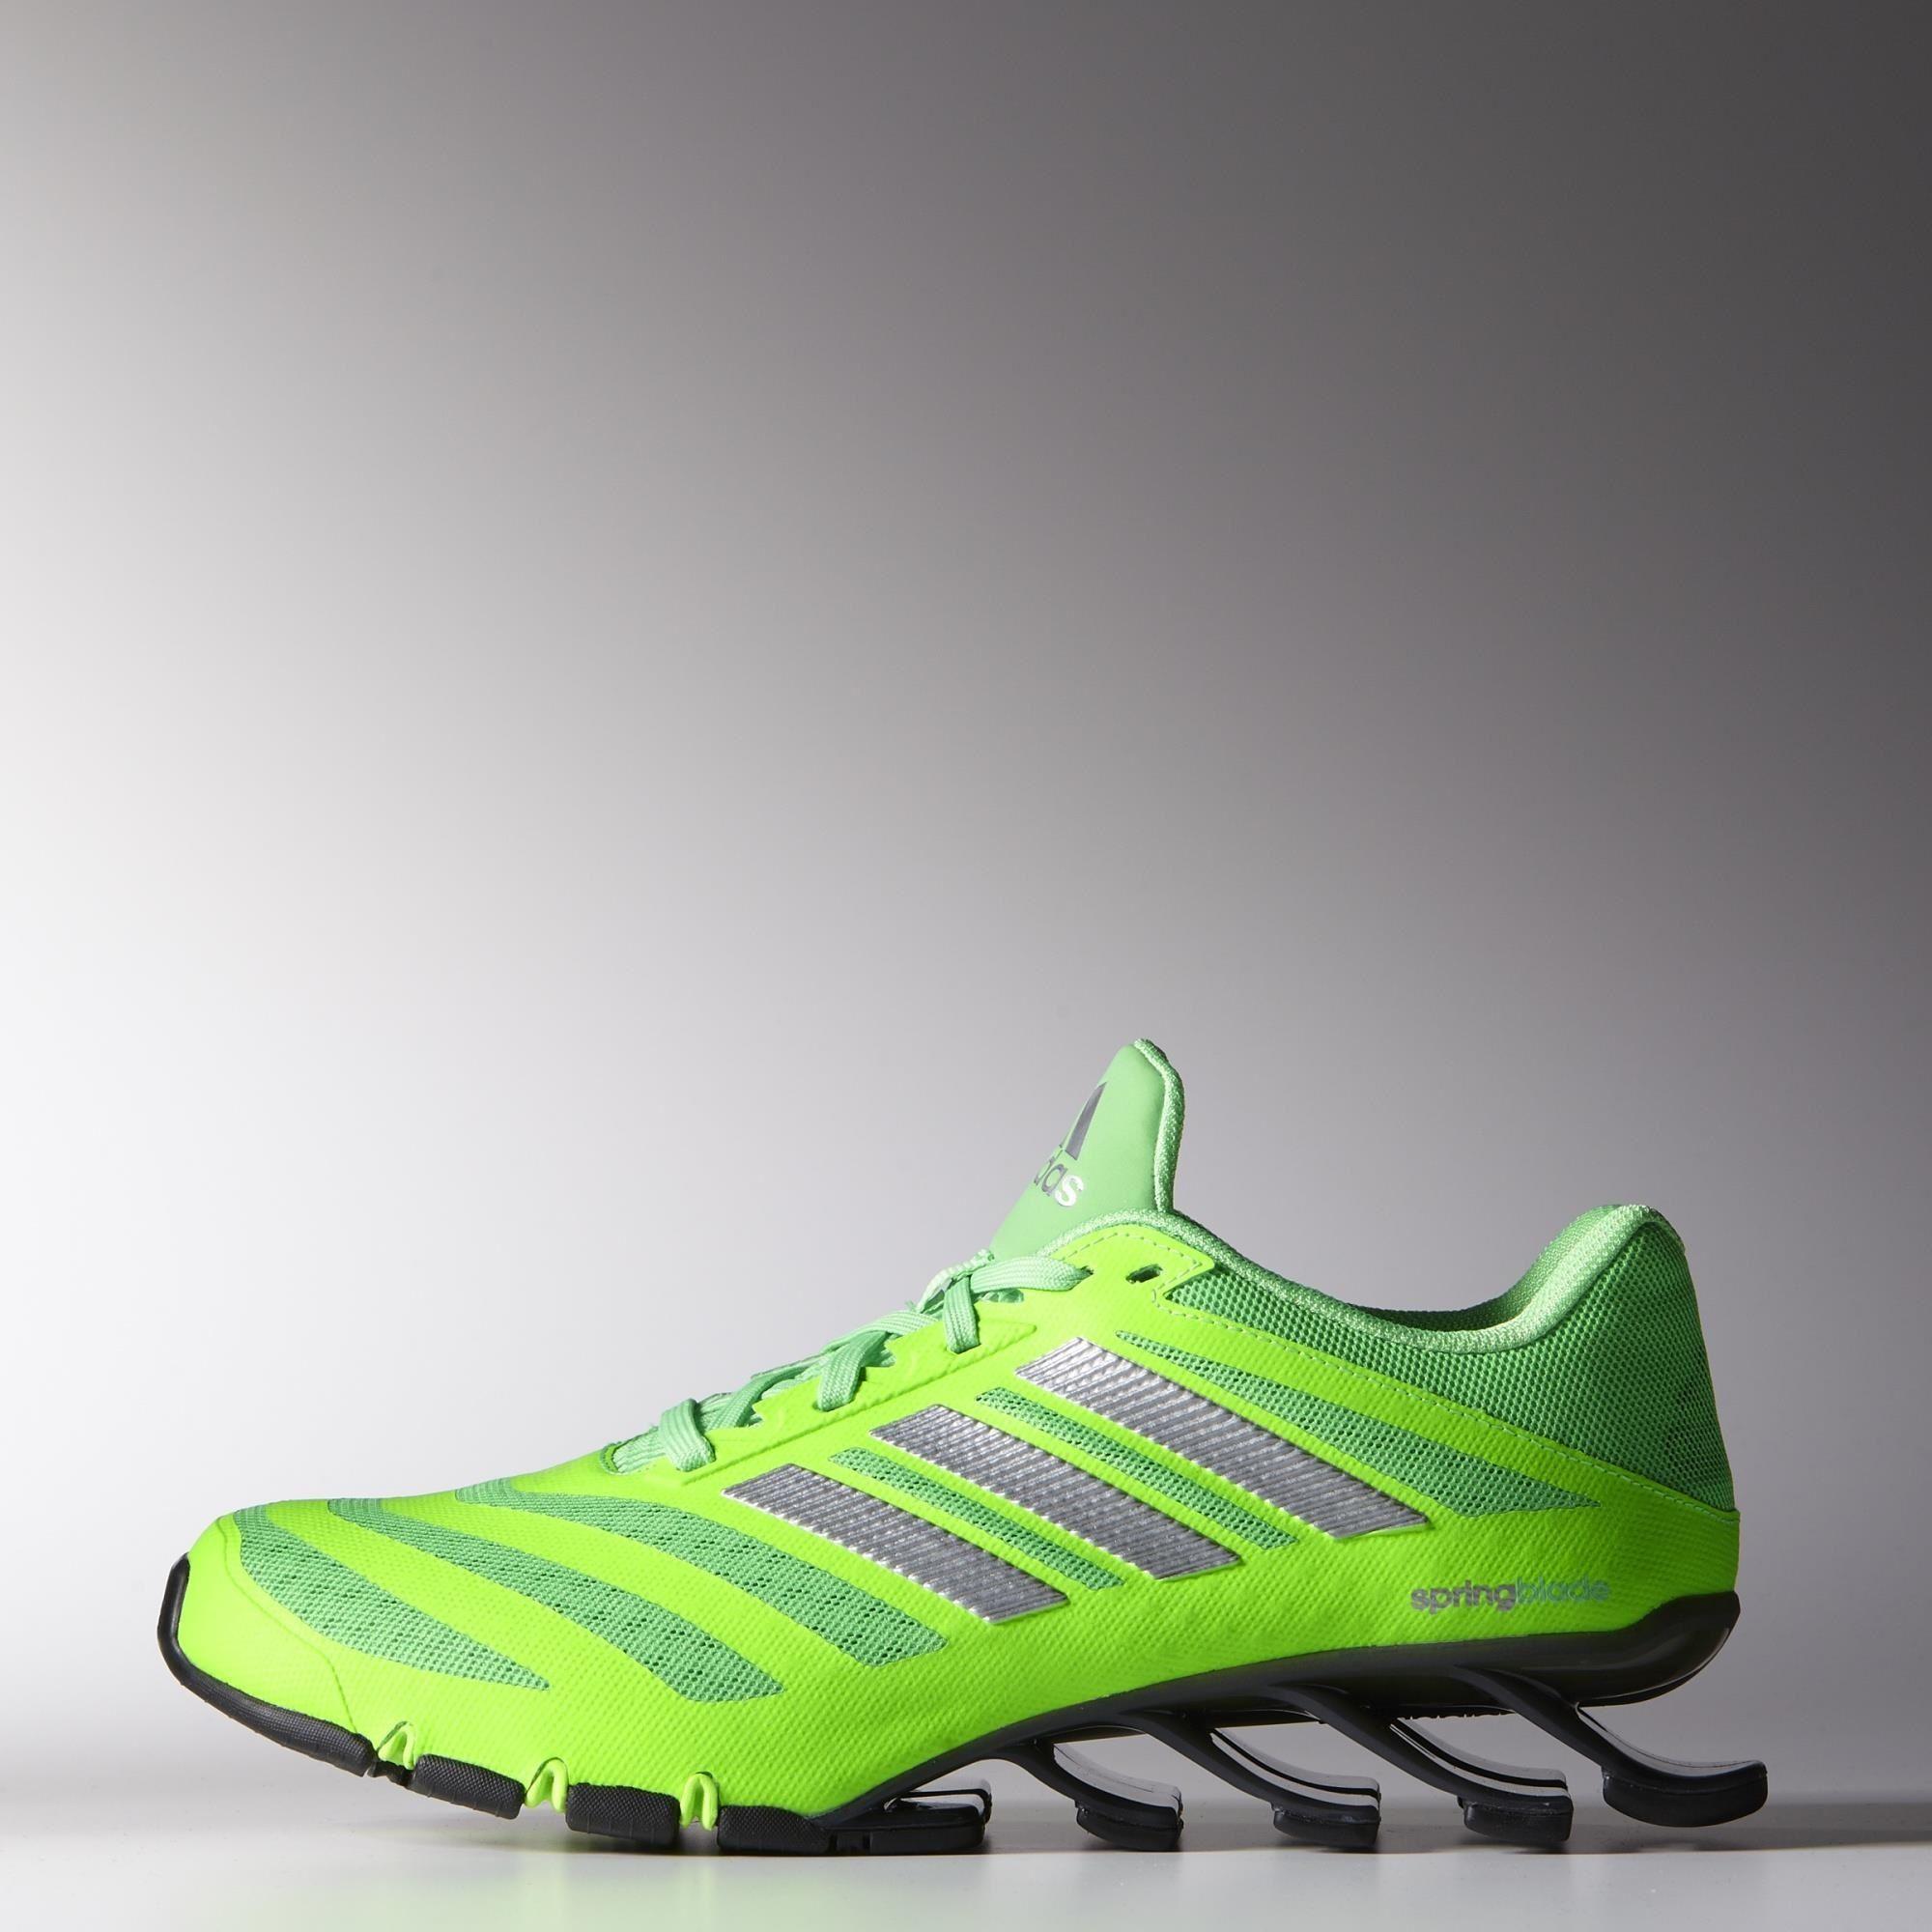 4c327e6406c15 adidas - Tênis SPRINGBLADE Ignite 2 Masculino | my stuff | Adidas ...